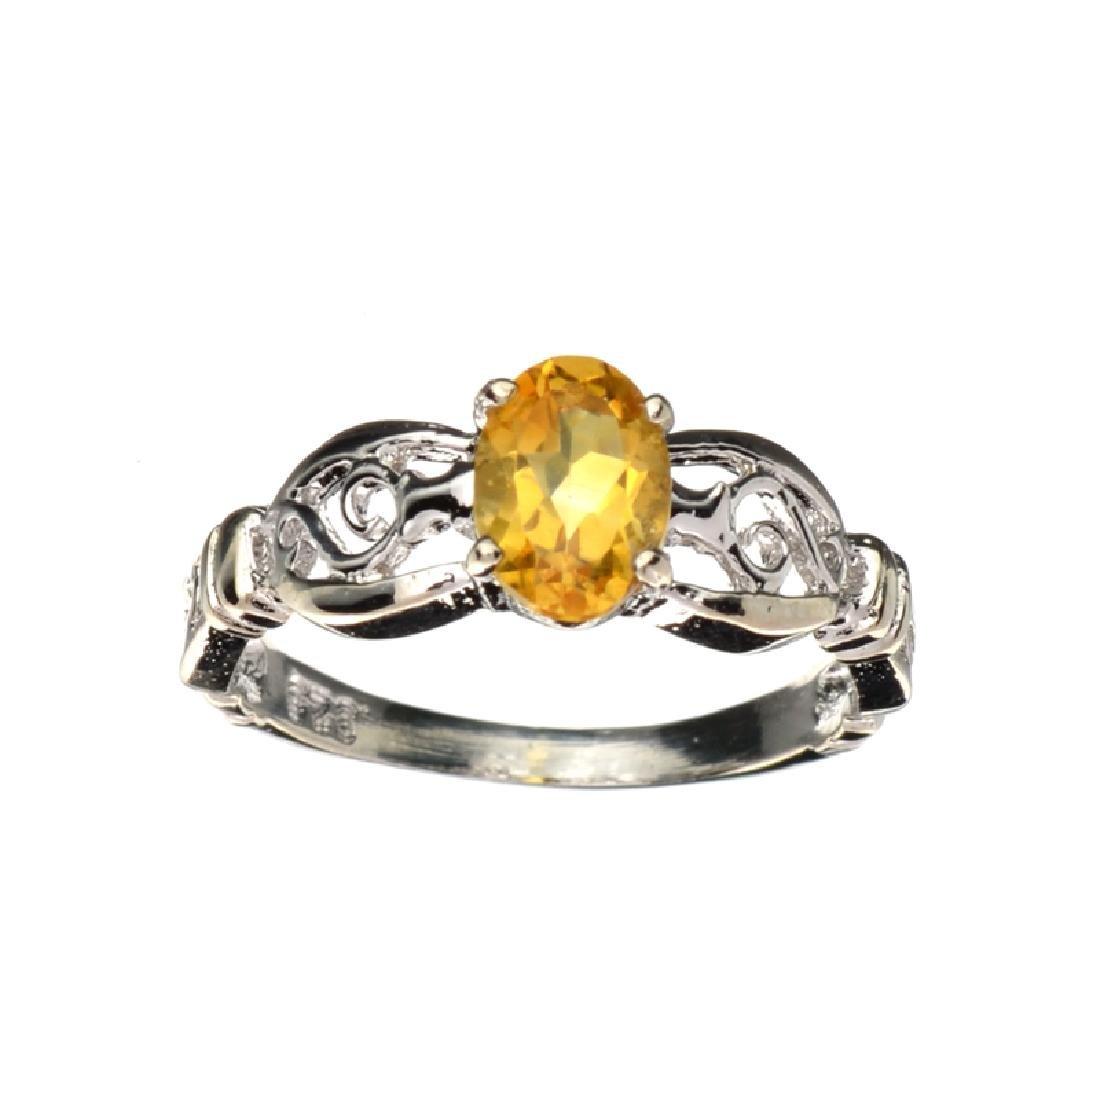 APP: 0.6k Fine Jewelry 0.86CT Oval Cut Citrine Quartz